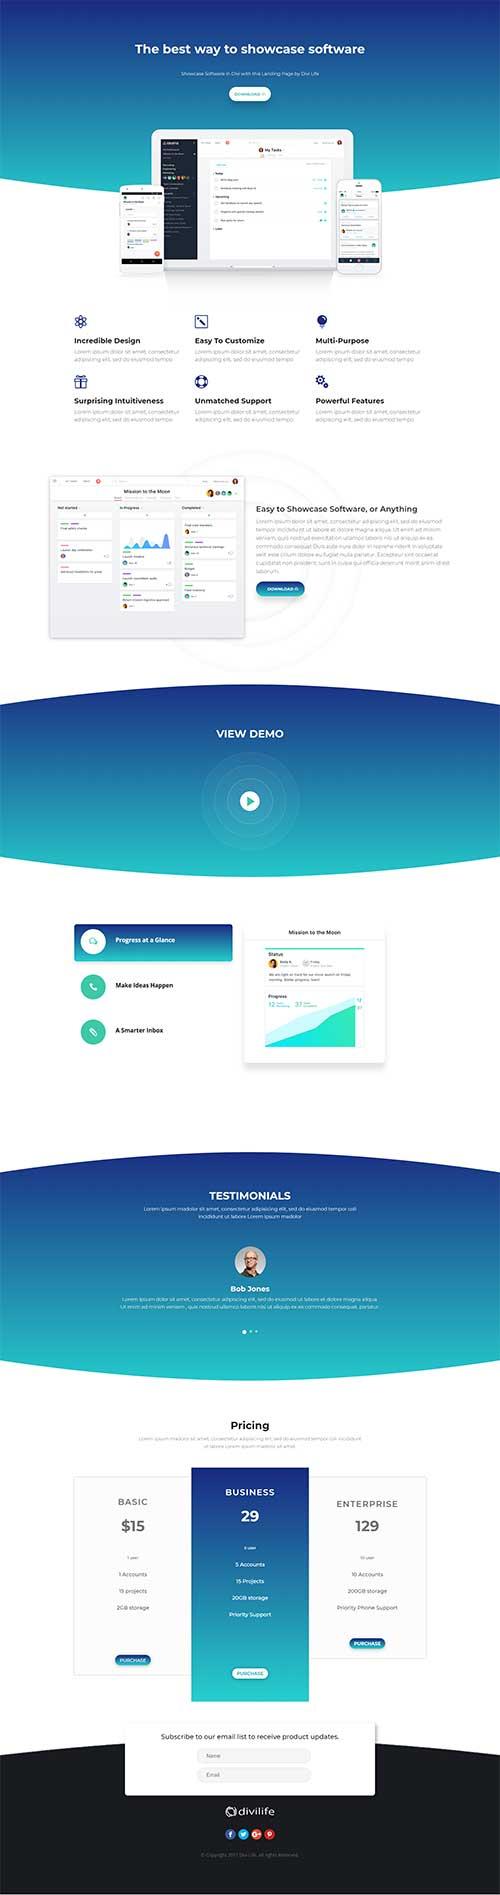 divi software landing page layout